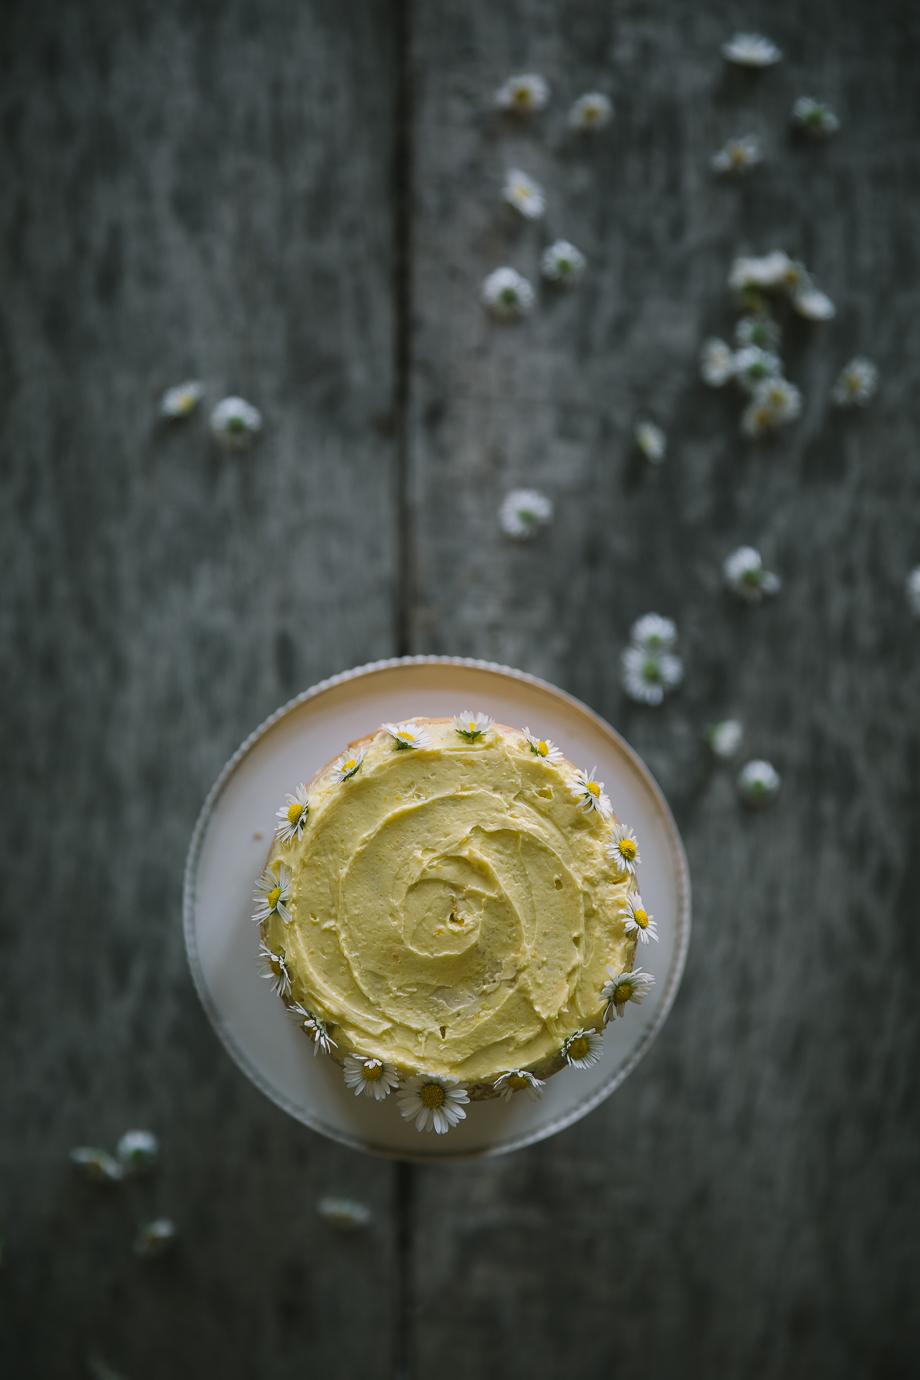 citromkrémes piskótatorta az Emlékek Íze konyhájából www.emlekekize.hu / lemon sponge cake with daisies from the Taste of Memories Hungarian country kitchen www.tasteofmemories.com